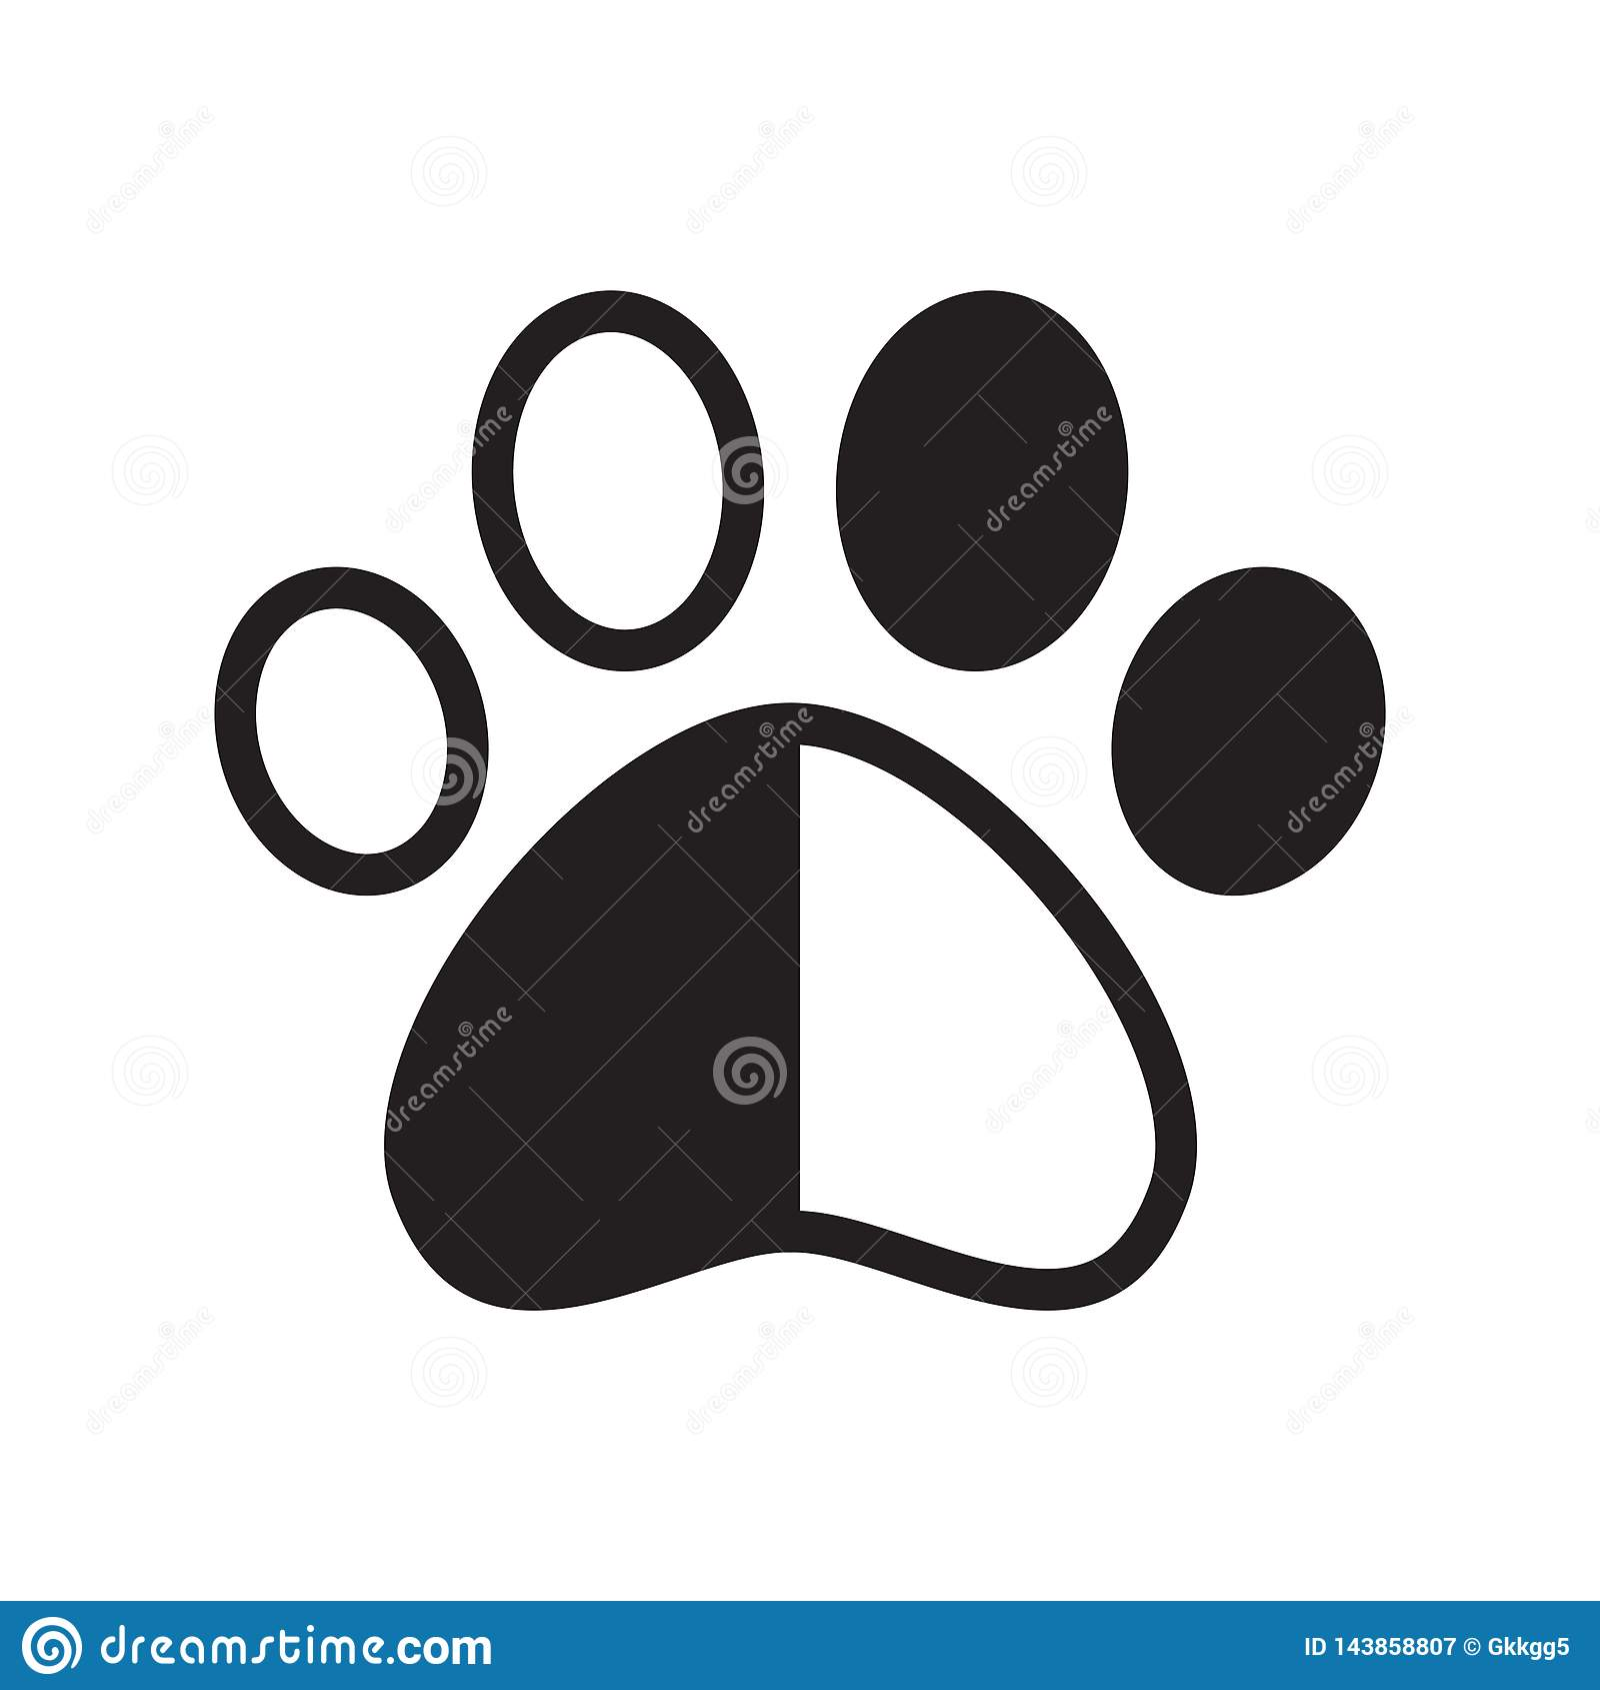 hight resolution of dog paw vector footprint icon logo pet cat kitten claw cartoon character graphic symbol illustration french bulldog bear